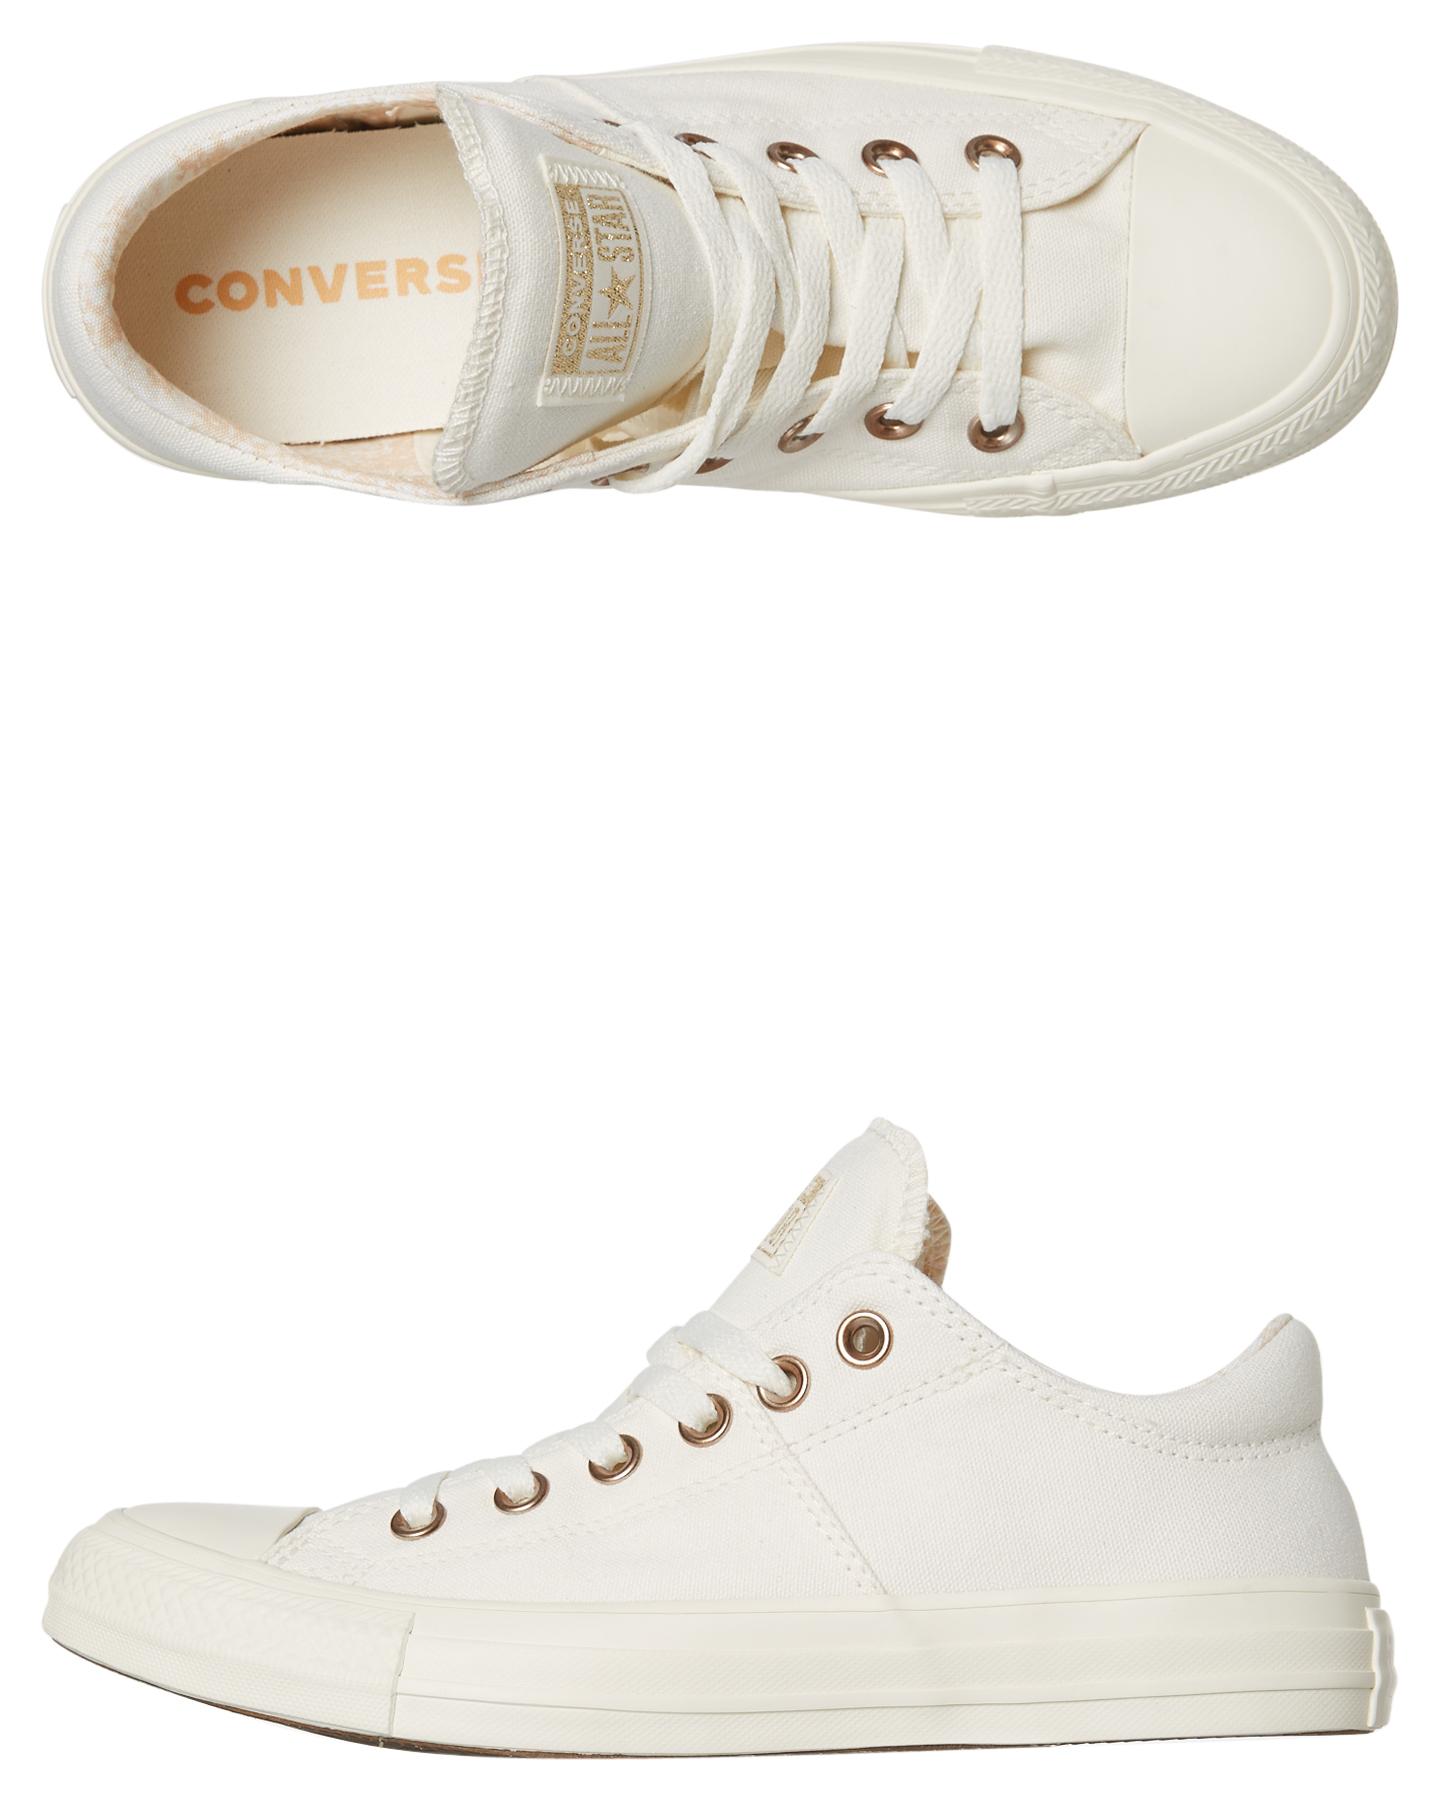 7ff85fbaa403 Converse Chuck Taylor All Star Madison Shoe - Egret